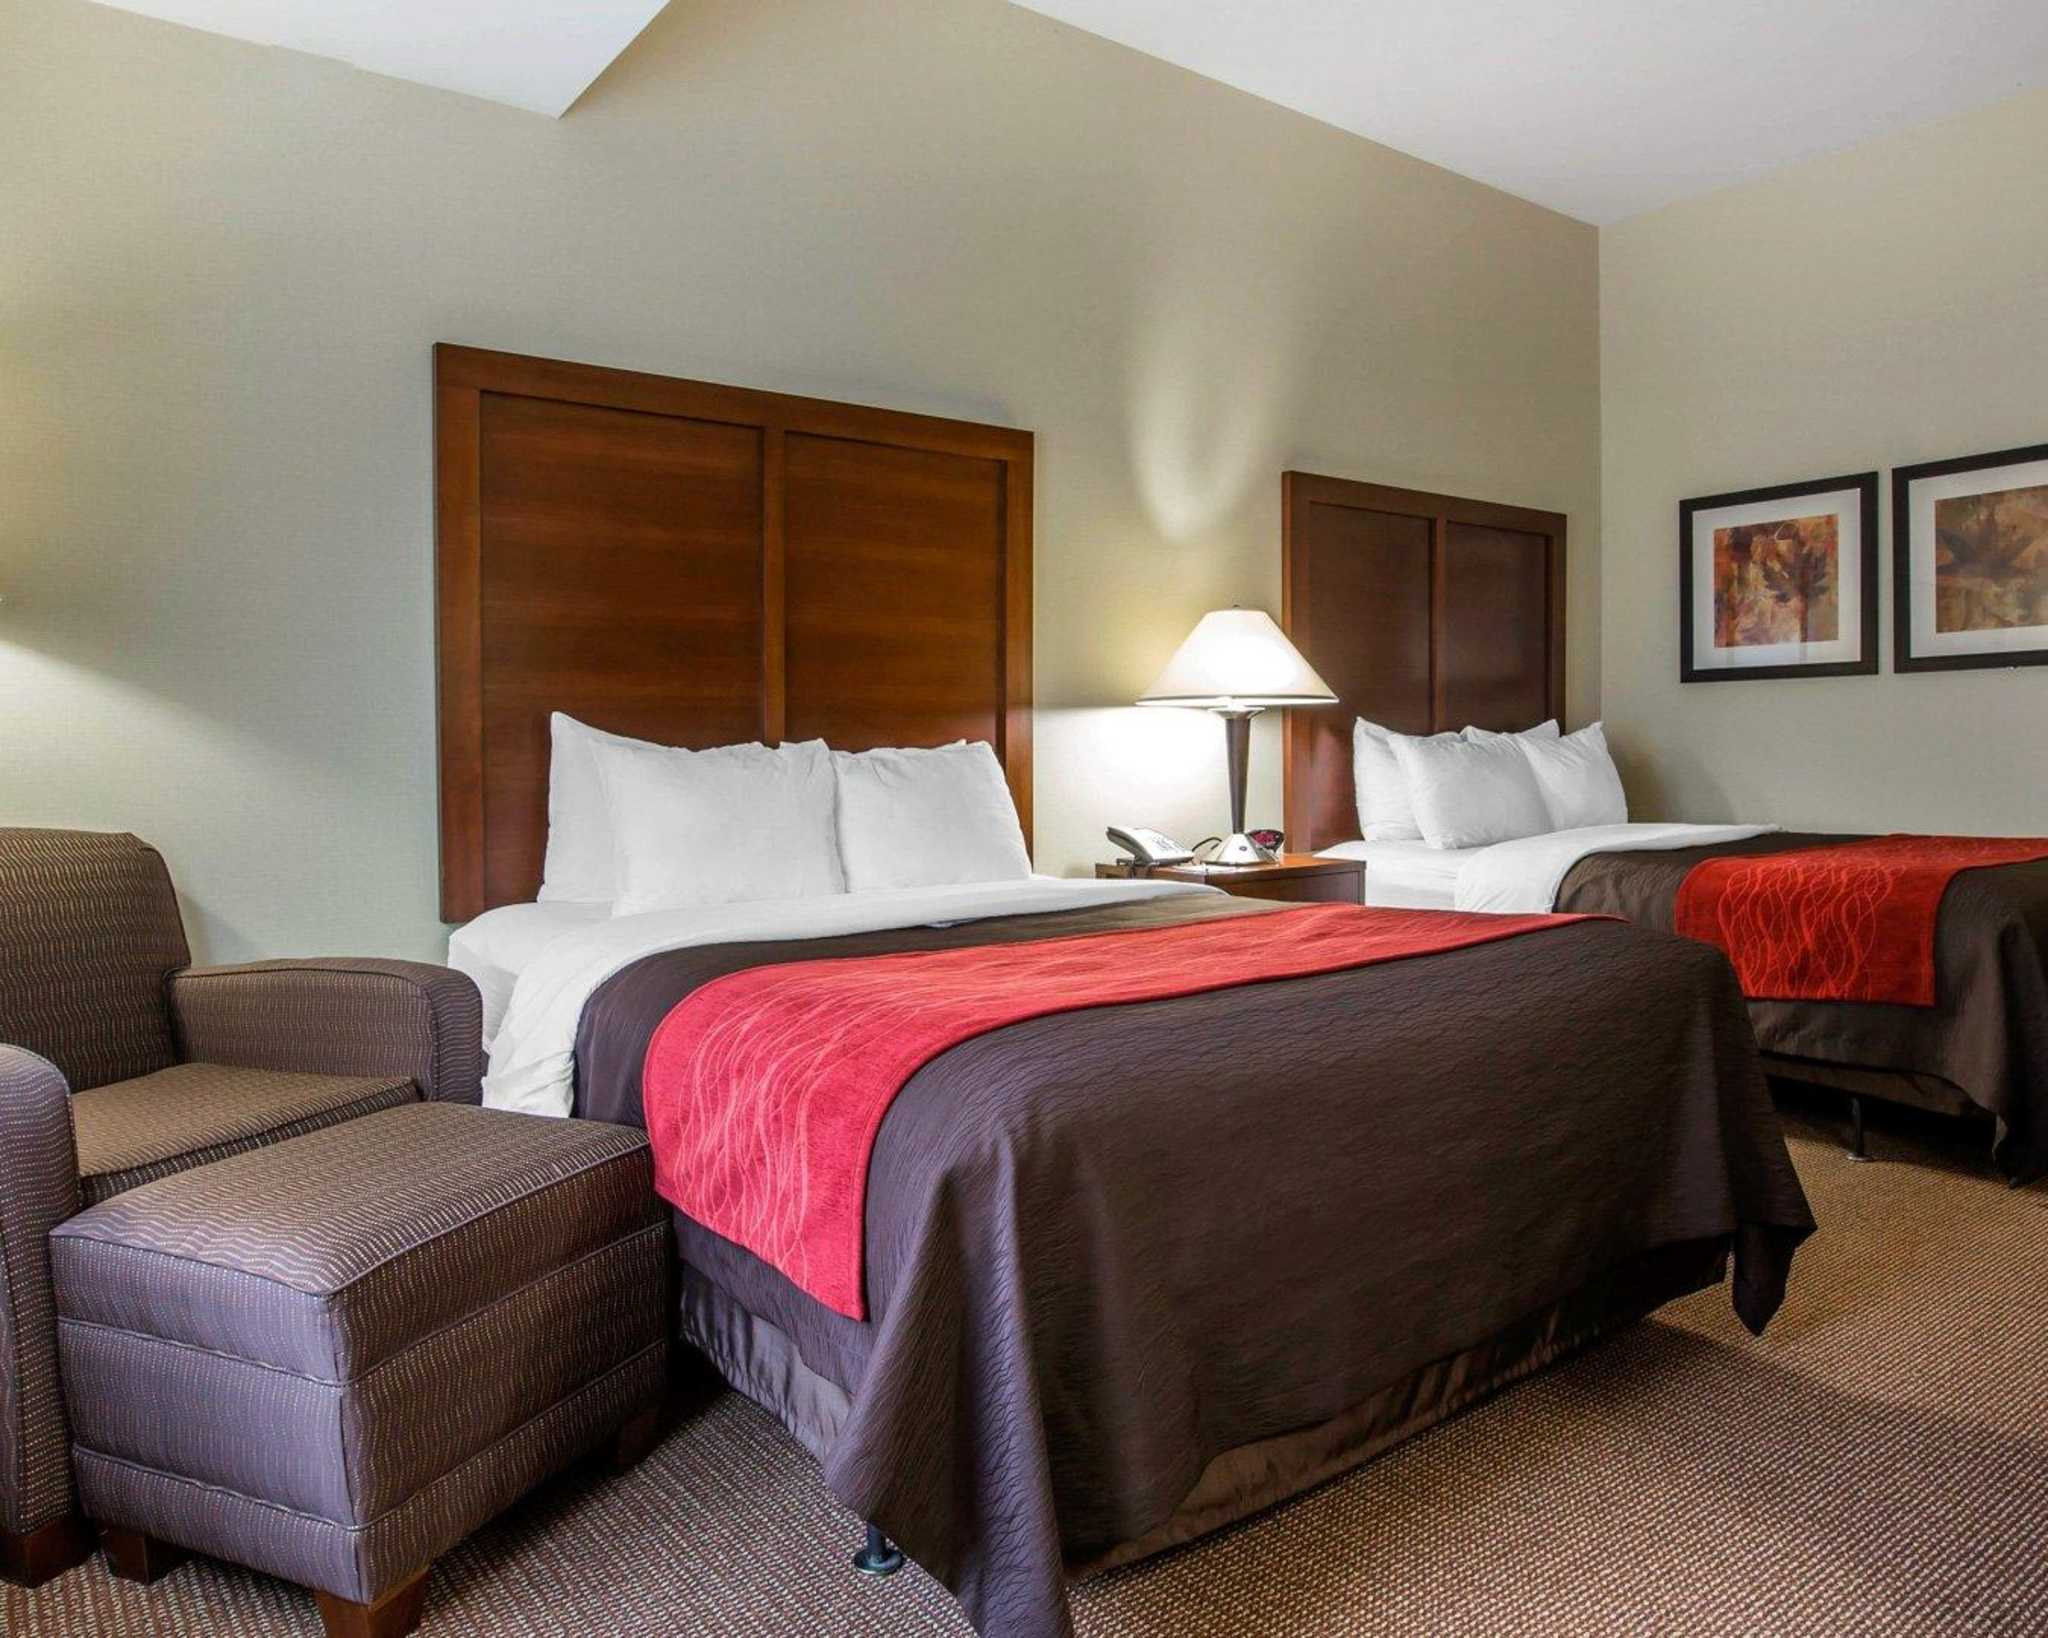 Comfort Inn & Suites adj to Akwesasne Mohawk Casino image 24